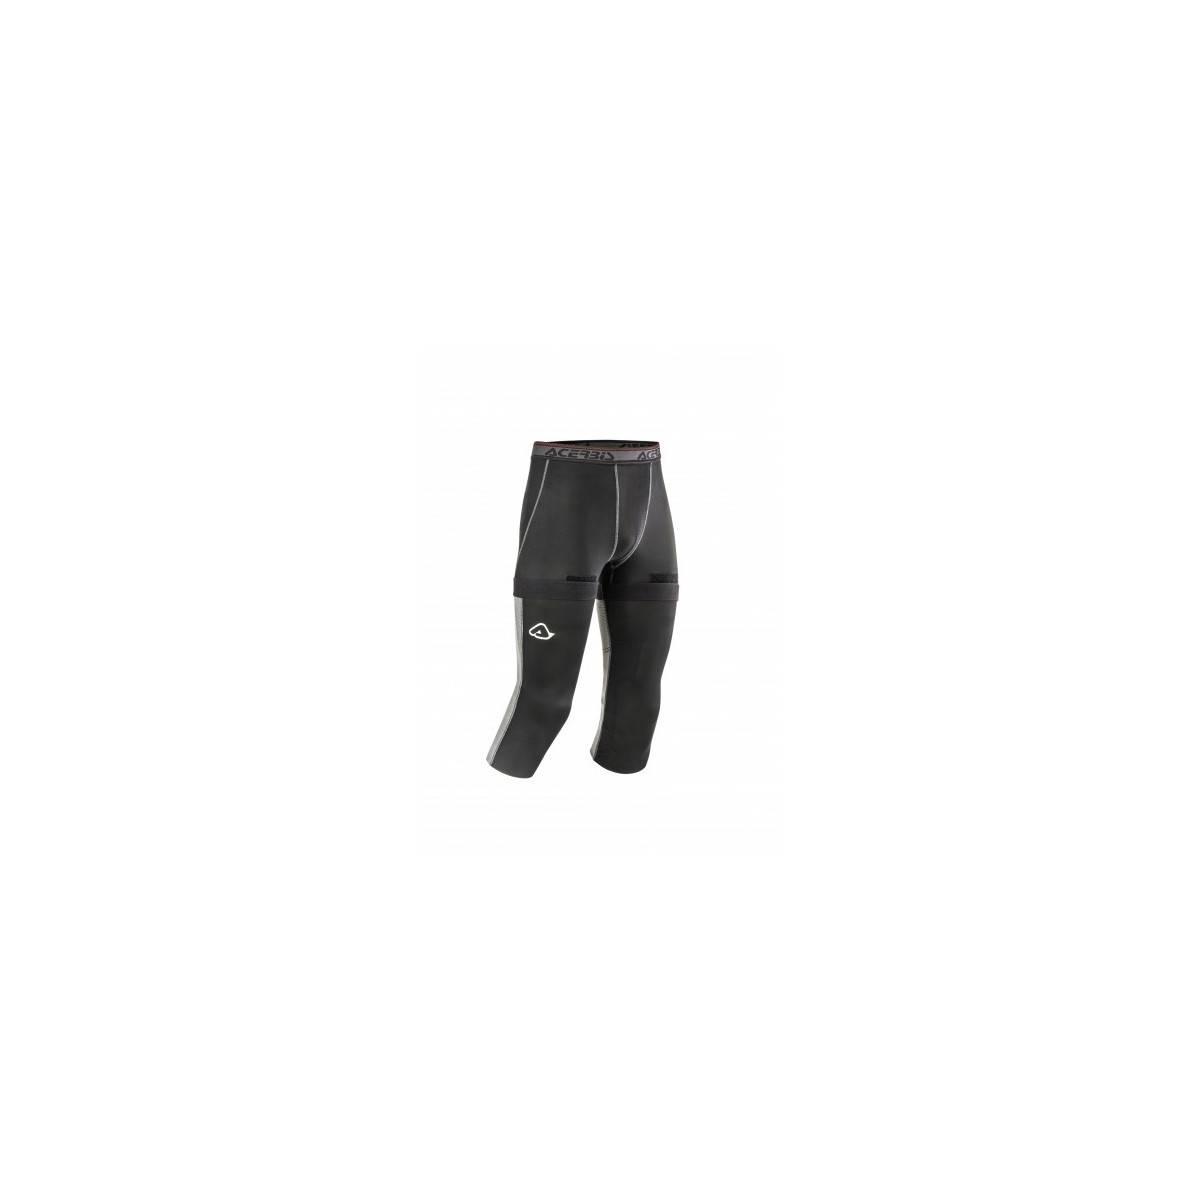 0022716-319 - Pantalon Refuerzo Interior Acerbis Negro Gris